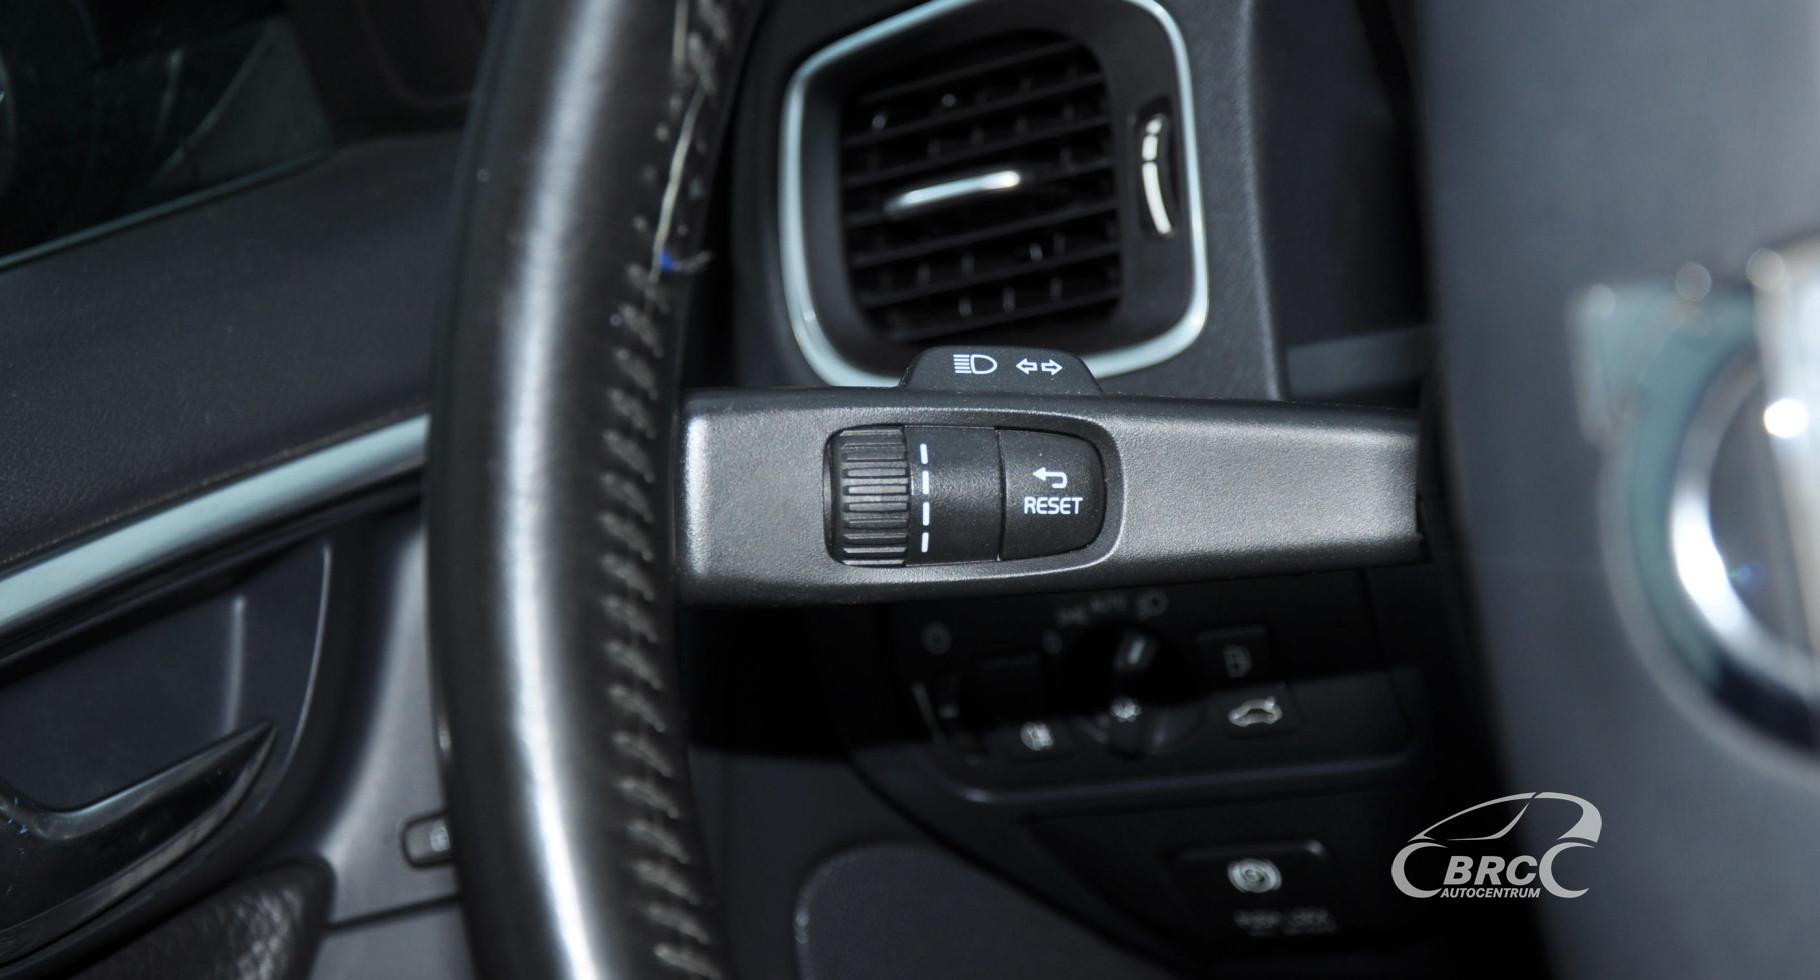 Volvo S60 2.5 T5 Automatas